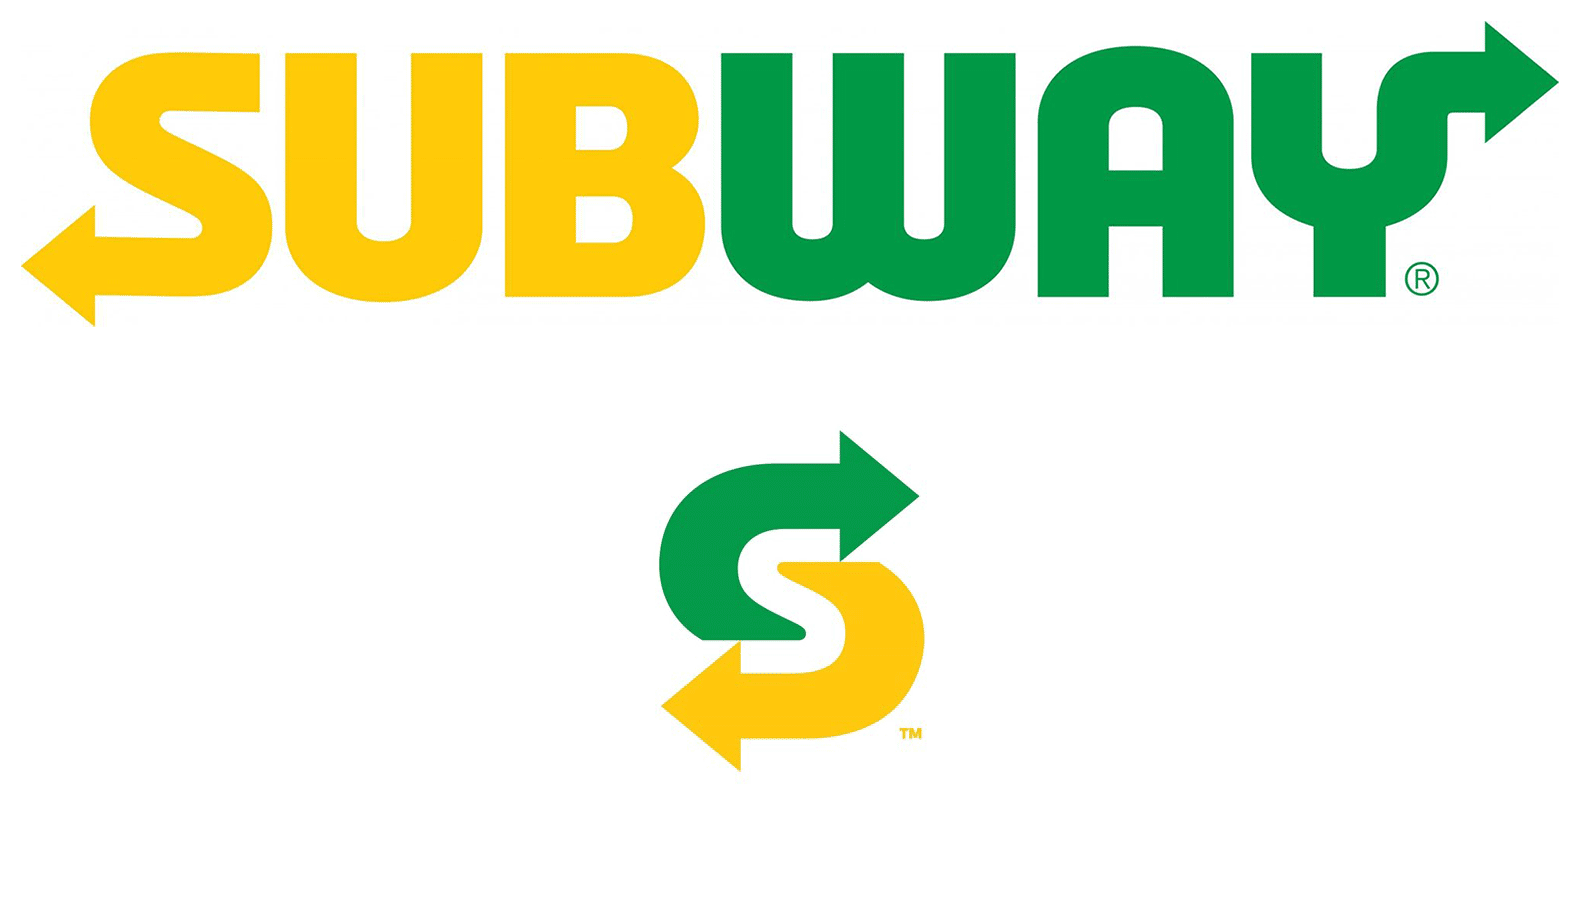 New Subway Logo Escapes Shitshow.